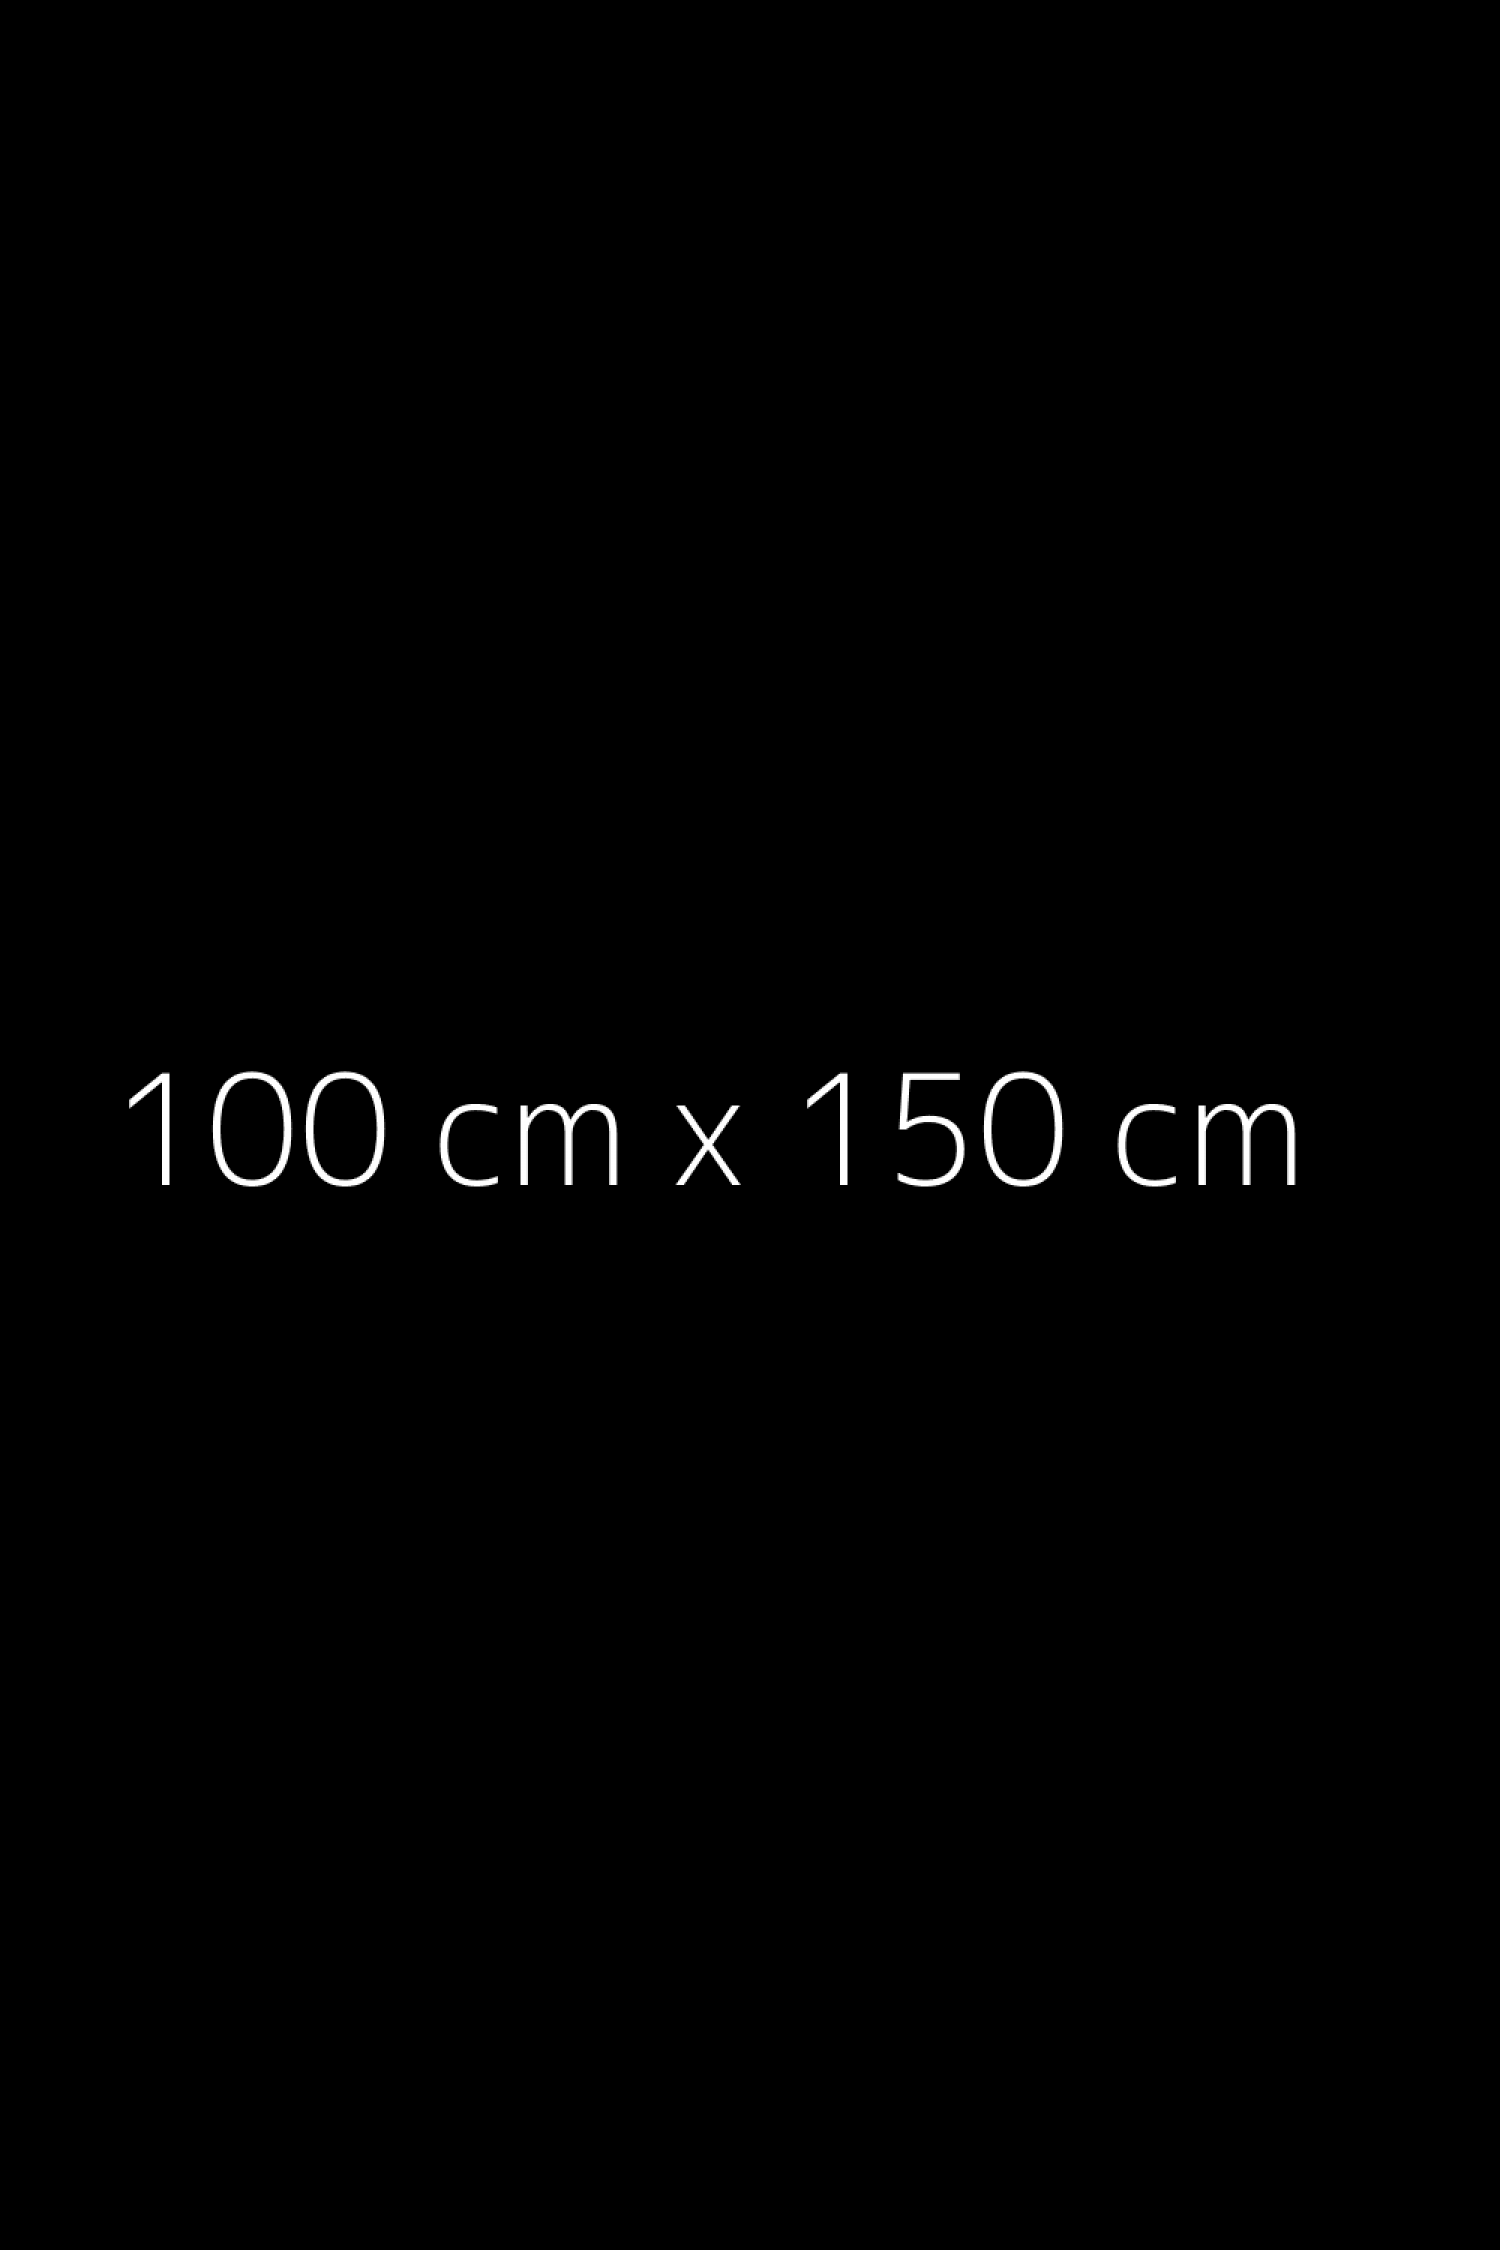 Reprodukcje format 100x150